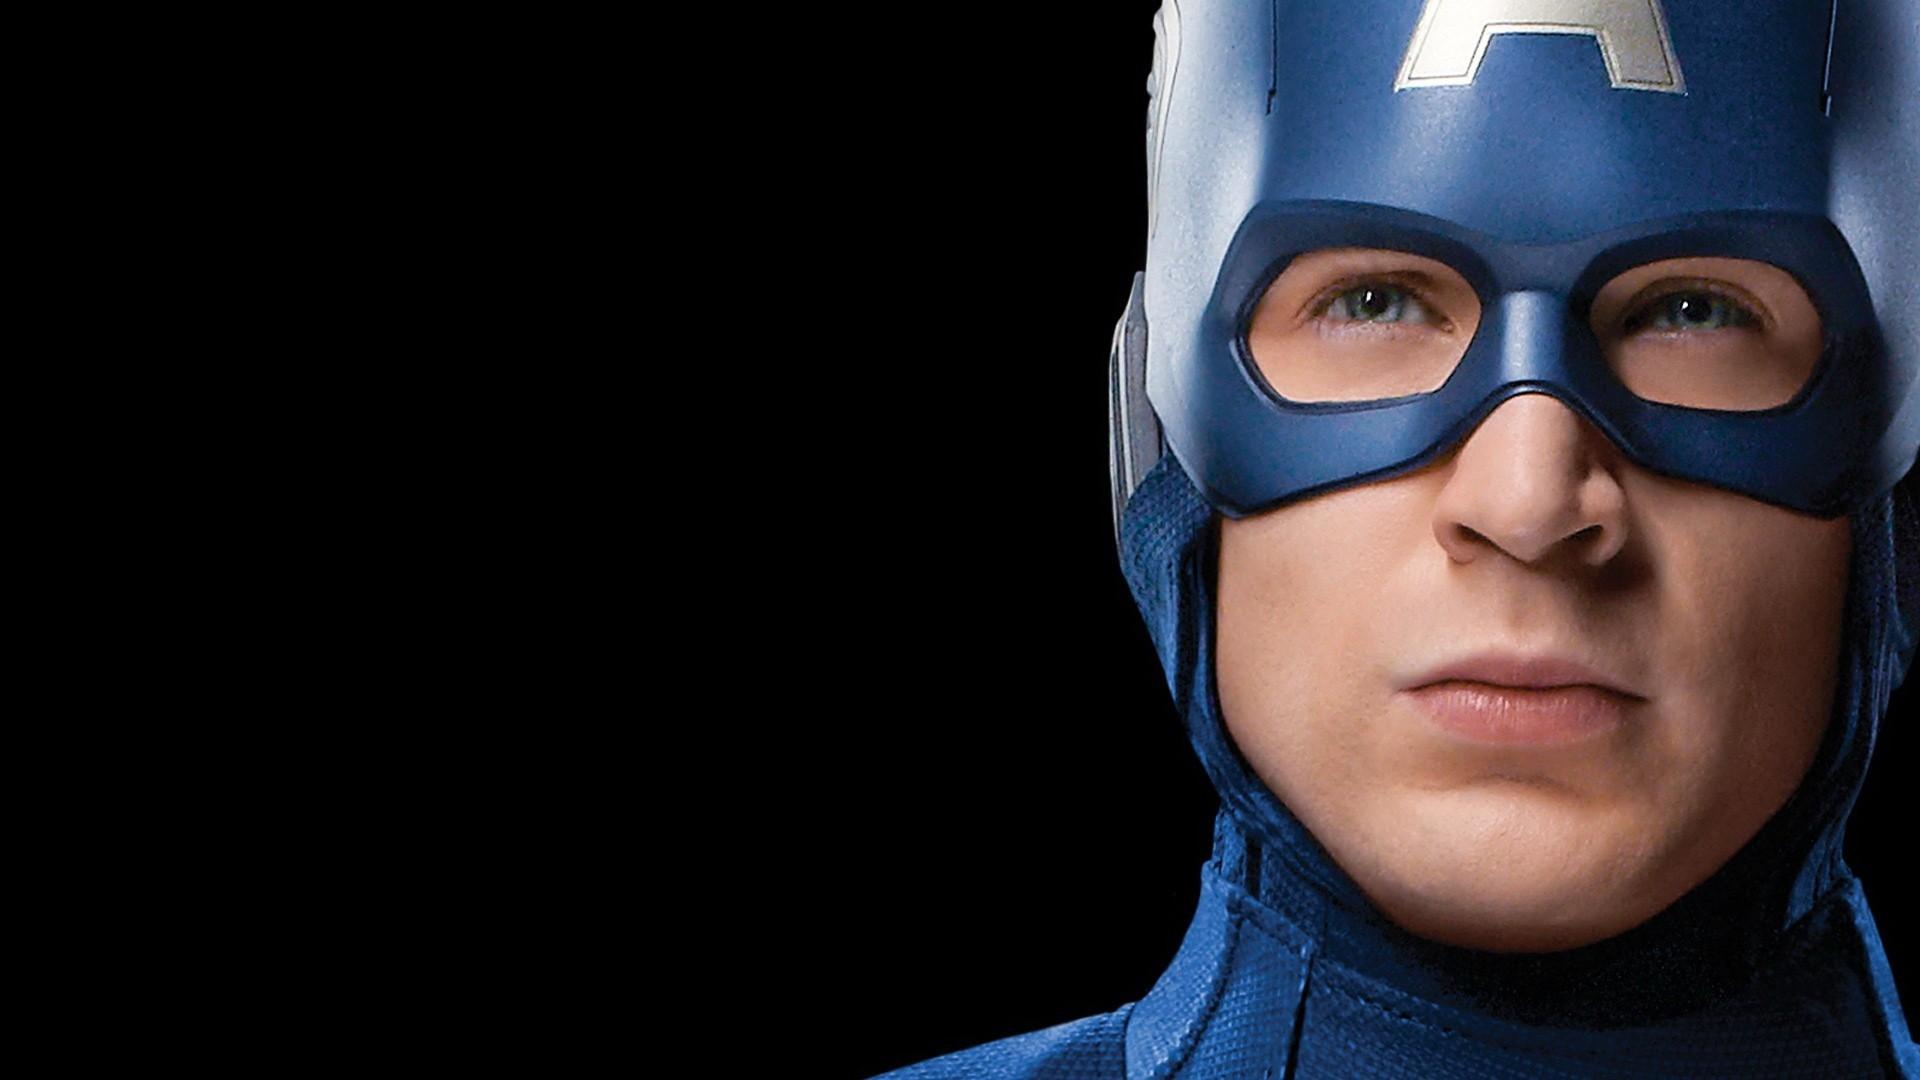 Captain America Wallpaper 1920x1080 Captain America Chris Evans 1920x1080